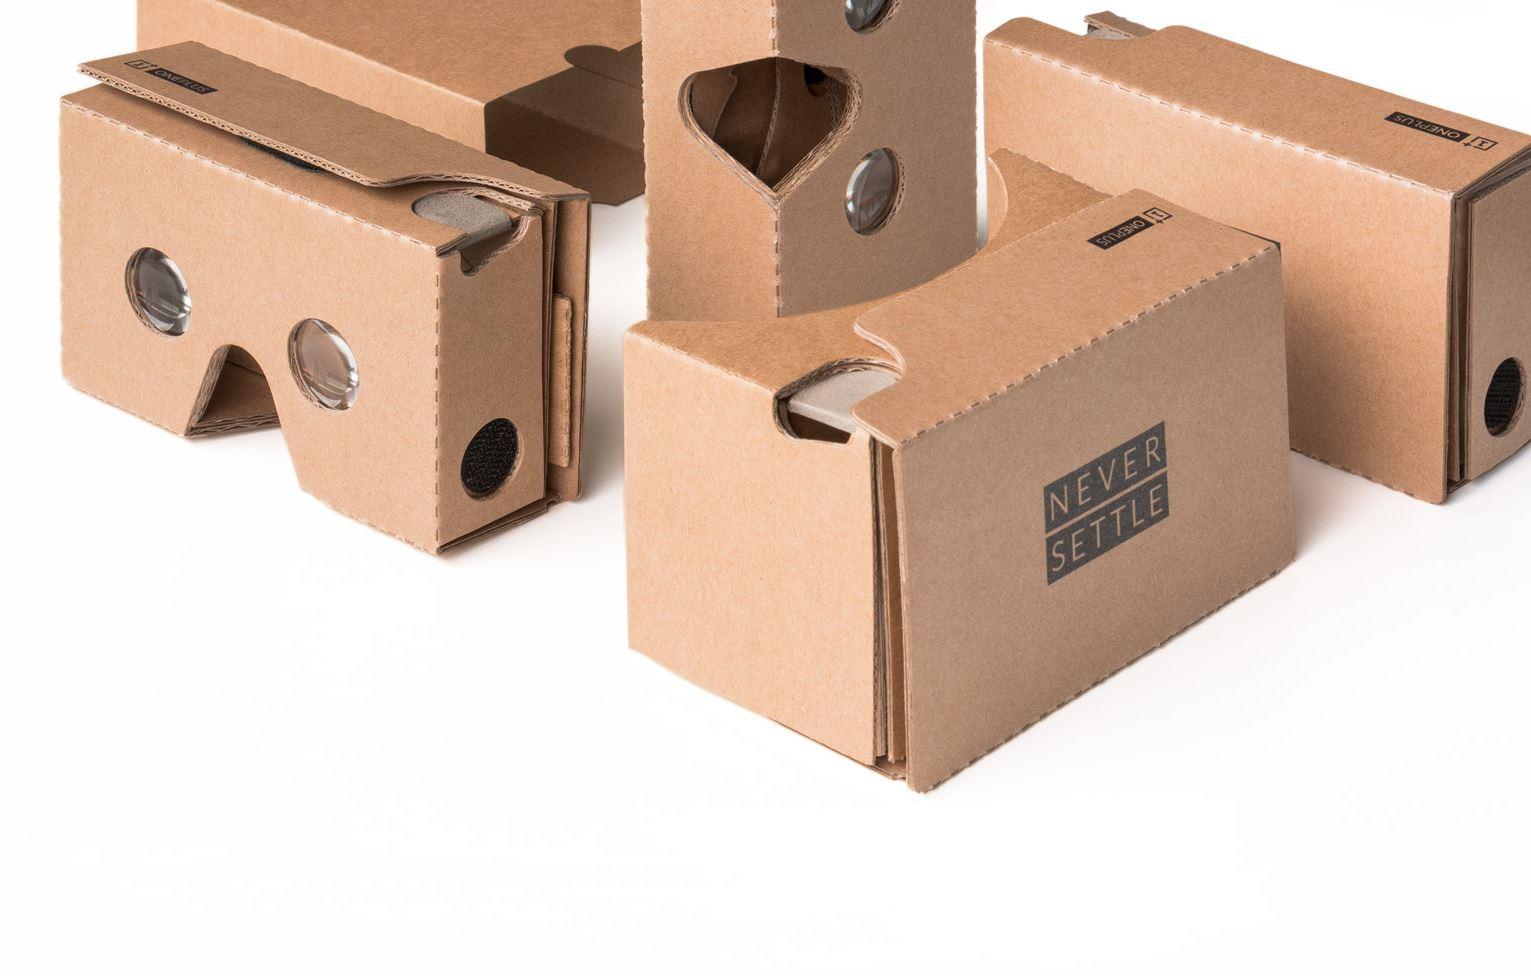 cardboard vr oneplus